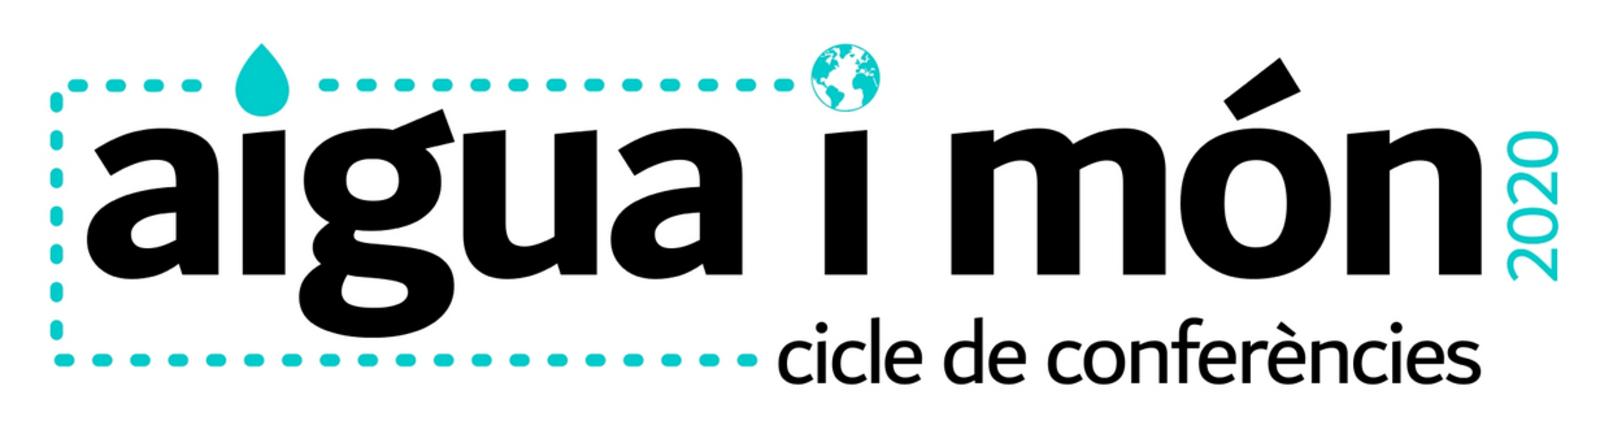 Conference cycle: Aigua i món (Water & World)